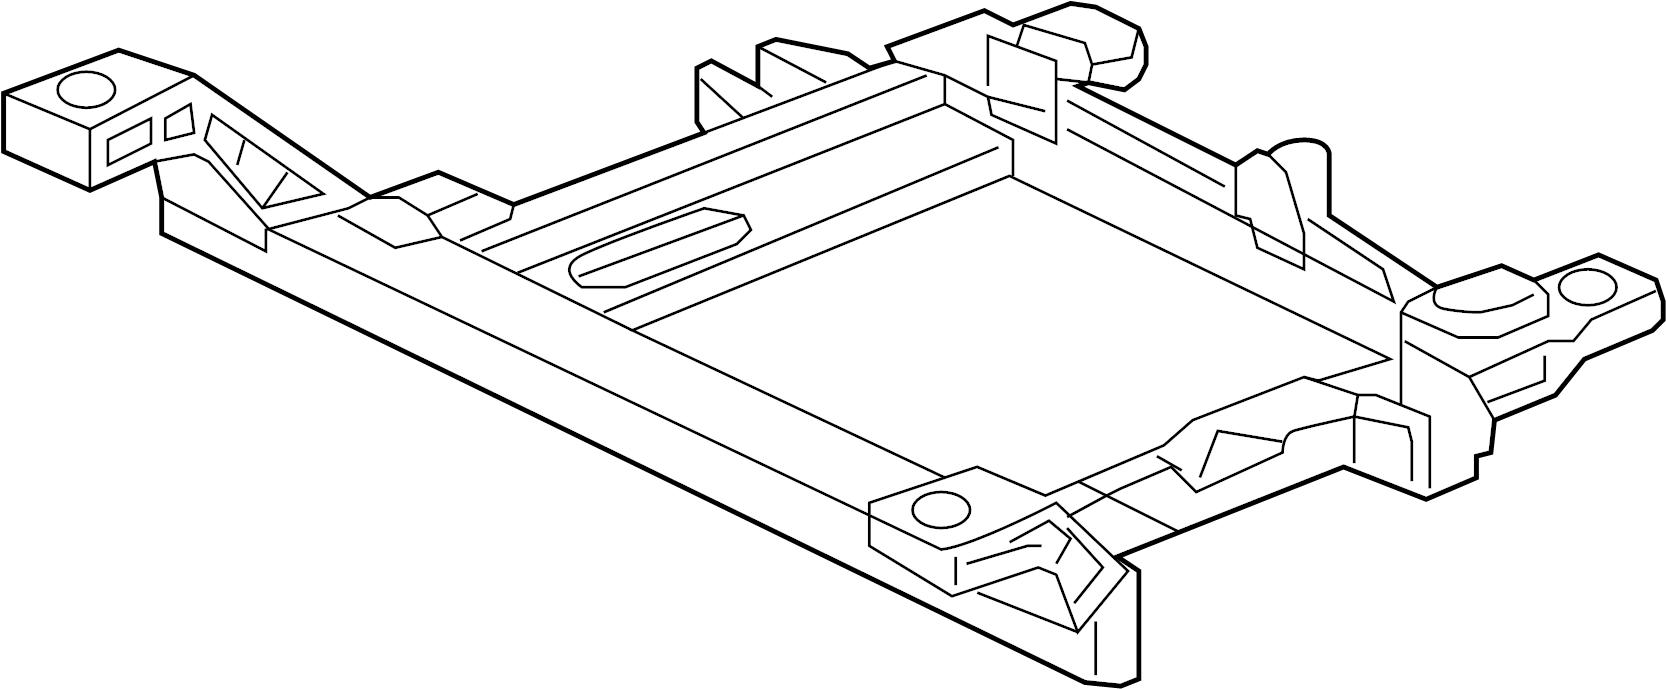 Chevrolet Monte Carlo Engine Cradle (Front). 5.3 liter